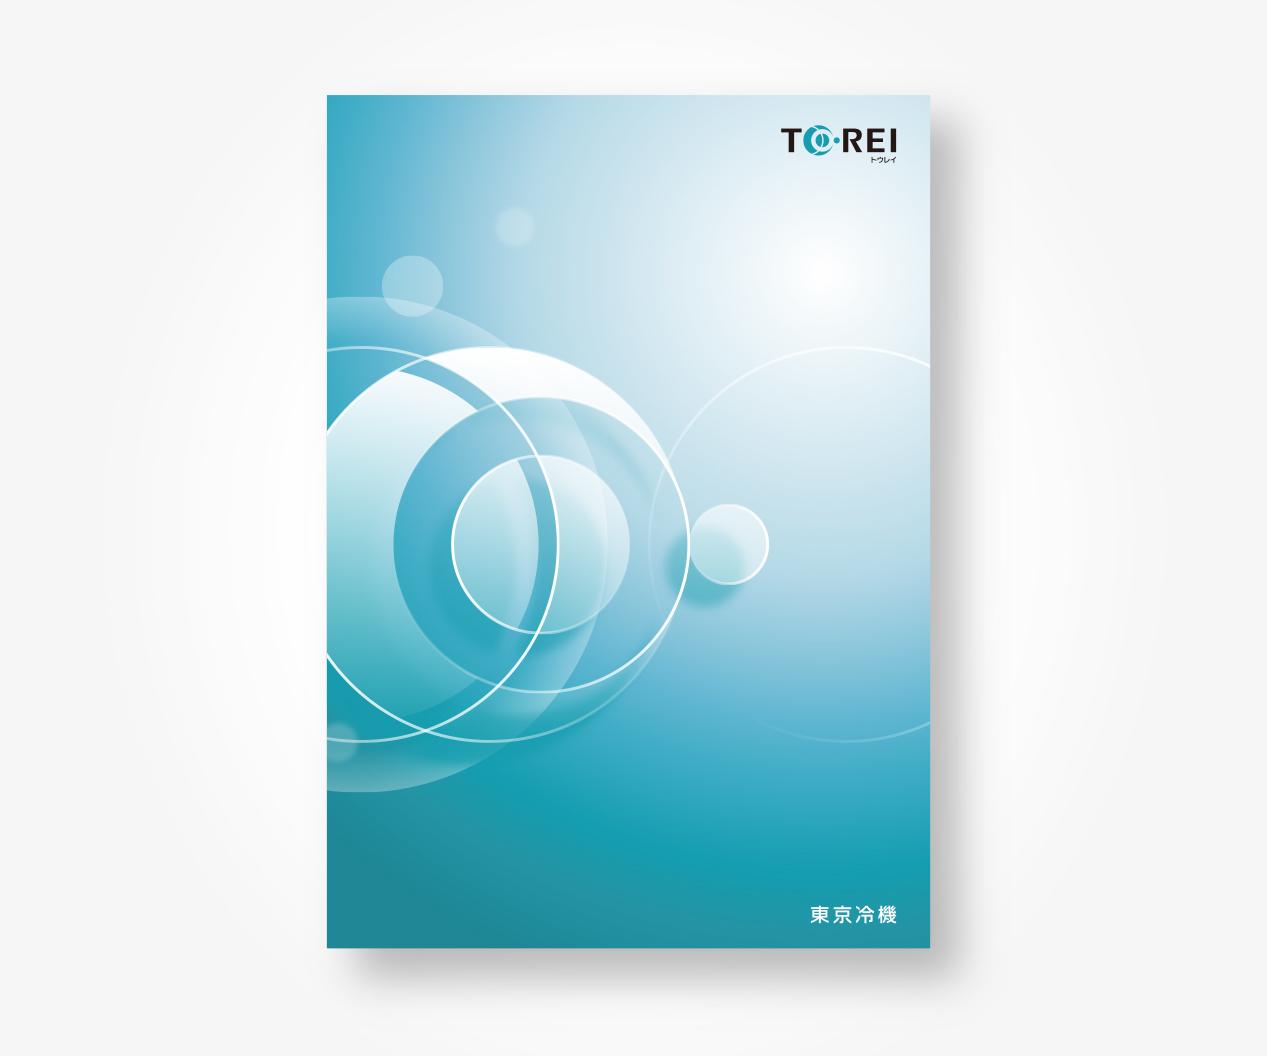 torei_01